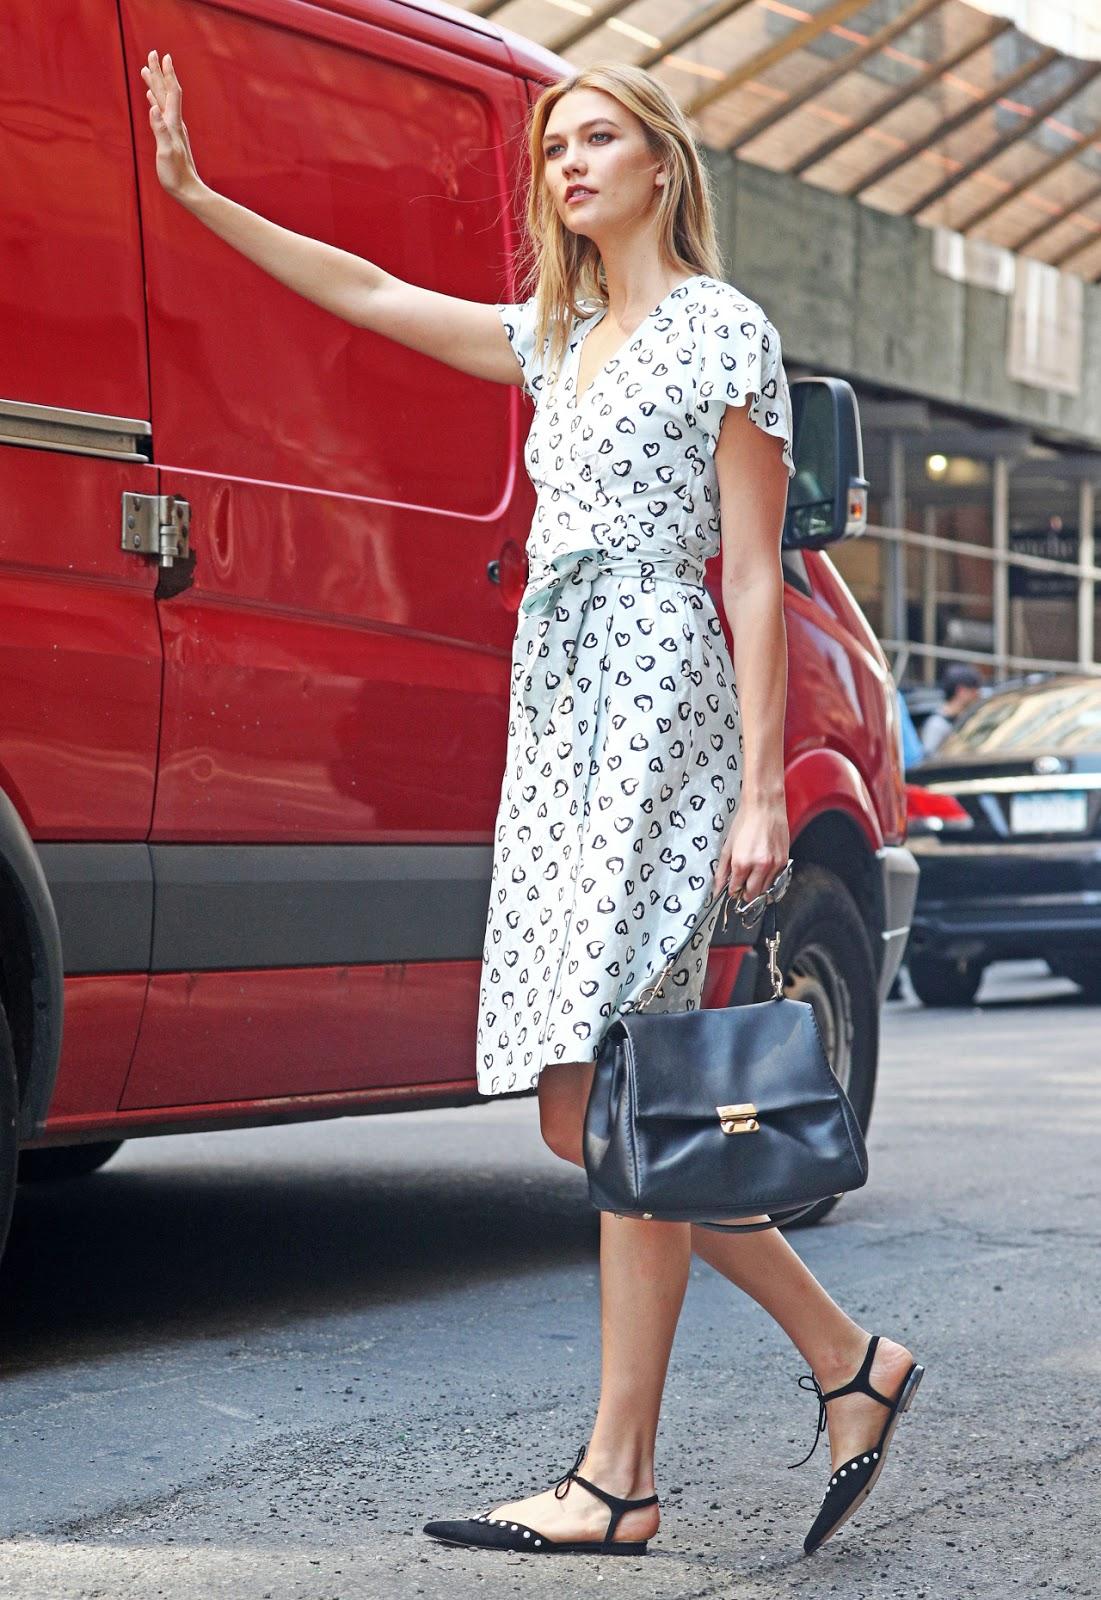 Karlie Kloss Wears Heart Print Dress in NYC